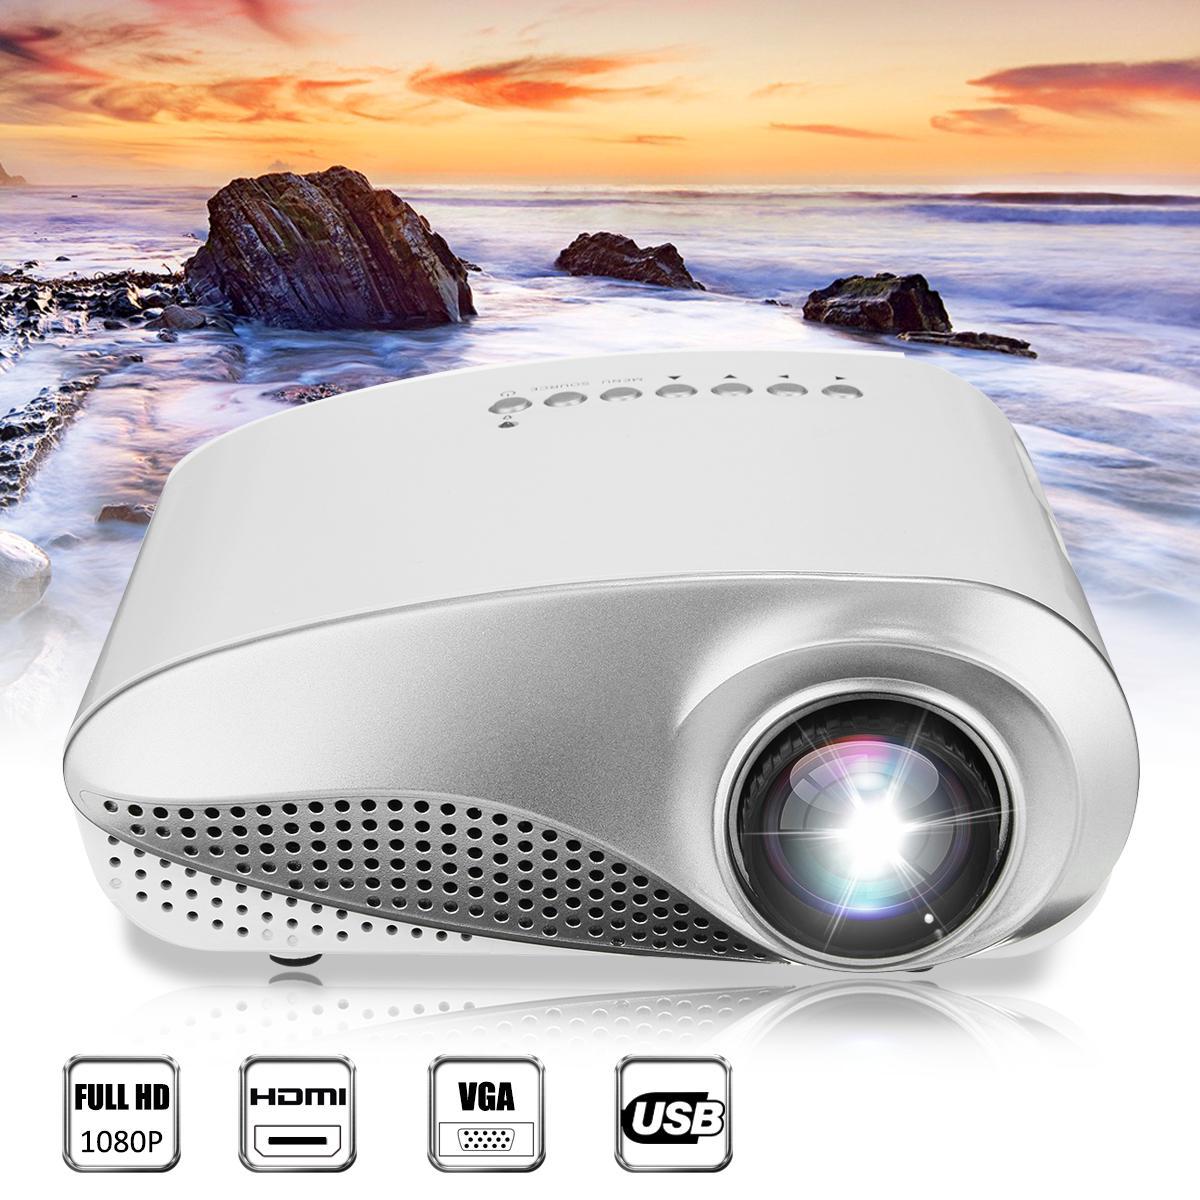 Portable Mini Projector LED 1080P Full HD 3D Multimedia For Home Theater Player HDMI VGA/ AV USB TV